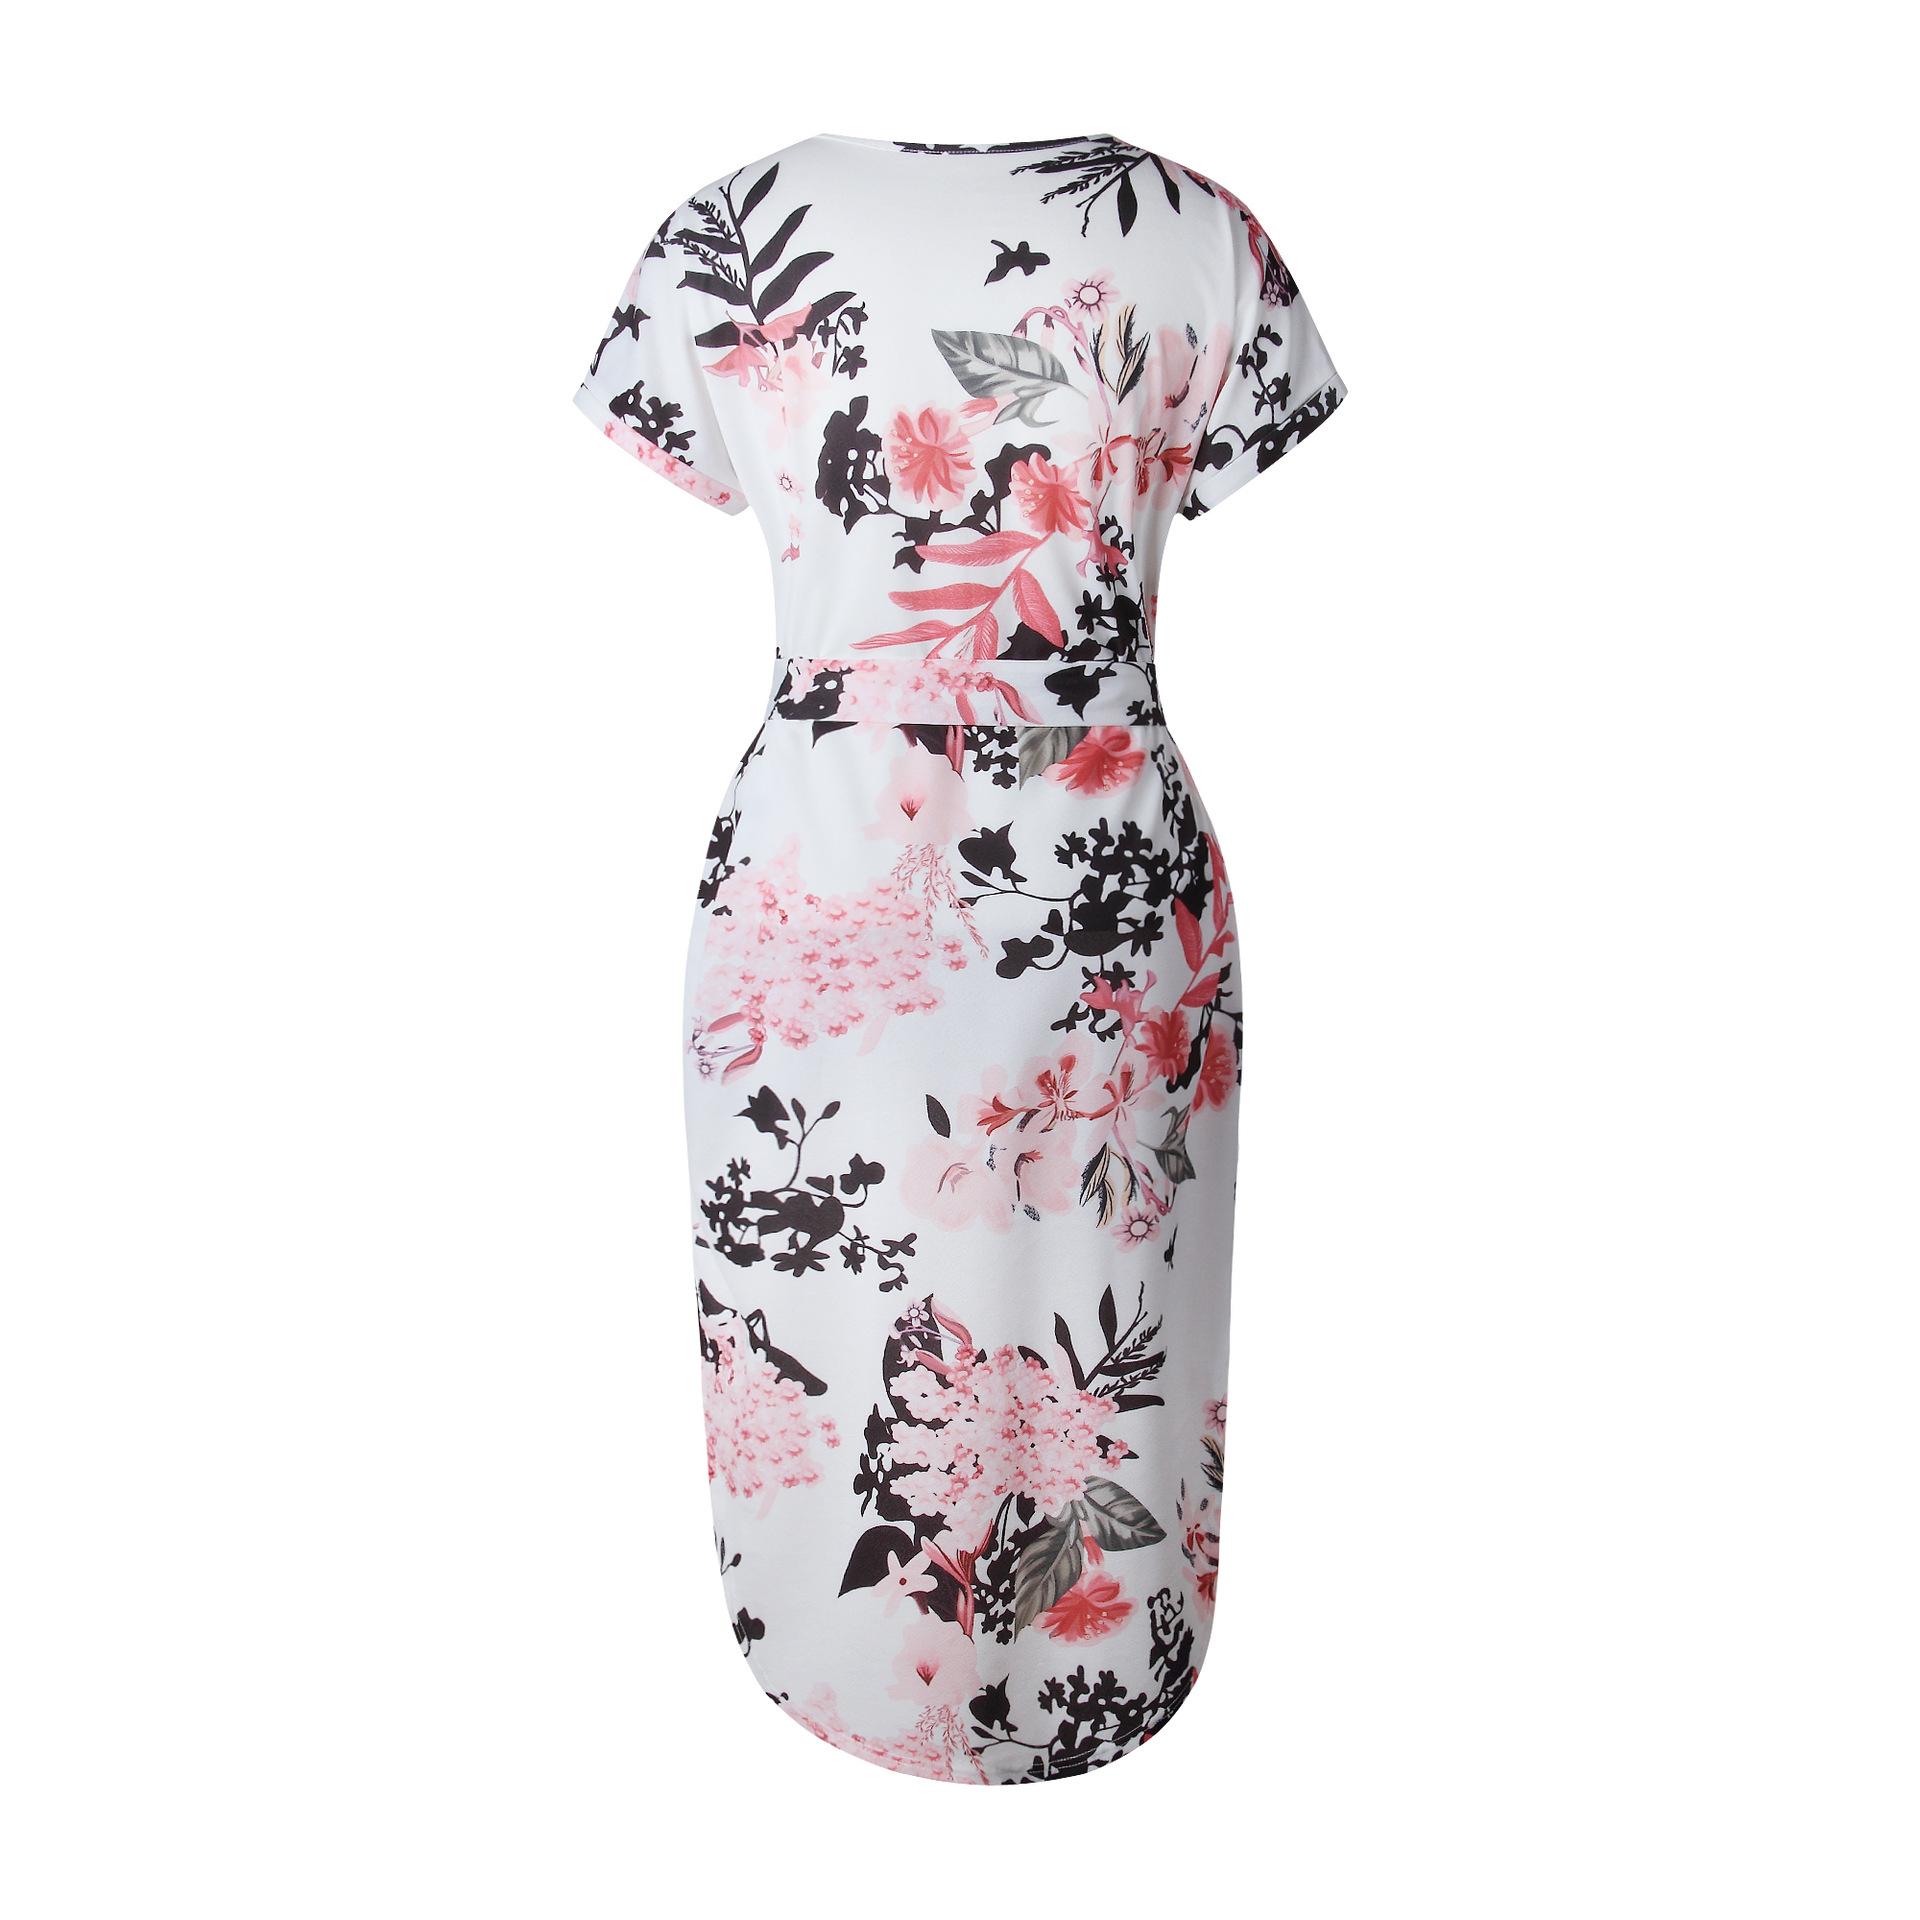 2018 Summer Dress Women Print V Neck Short Sleeve Robe Female Dresses Casual Sashes Midi Dress Ladies Elegant Vestidos Dropship 17